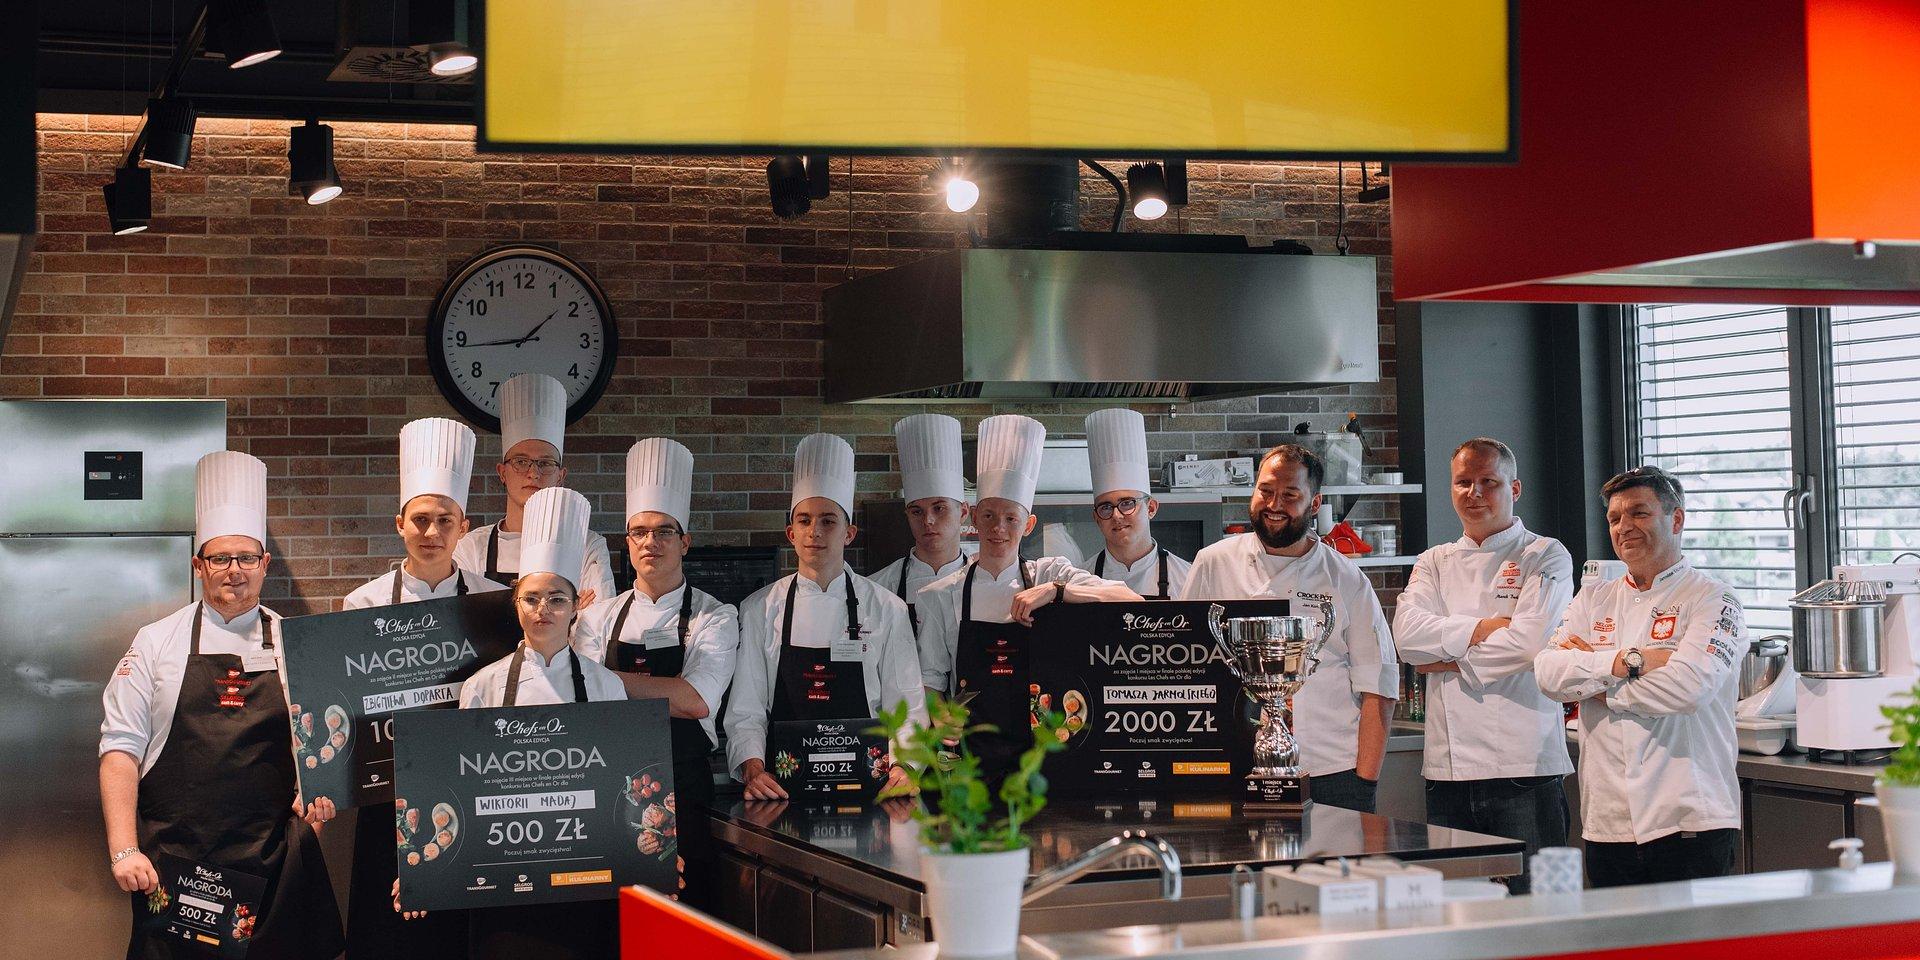 Polska edycja konkursu Les Chefs en Or rozstrzygnięta!